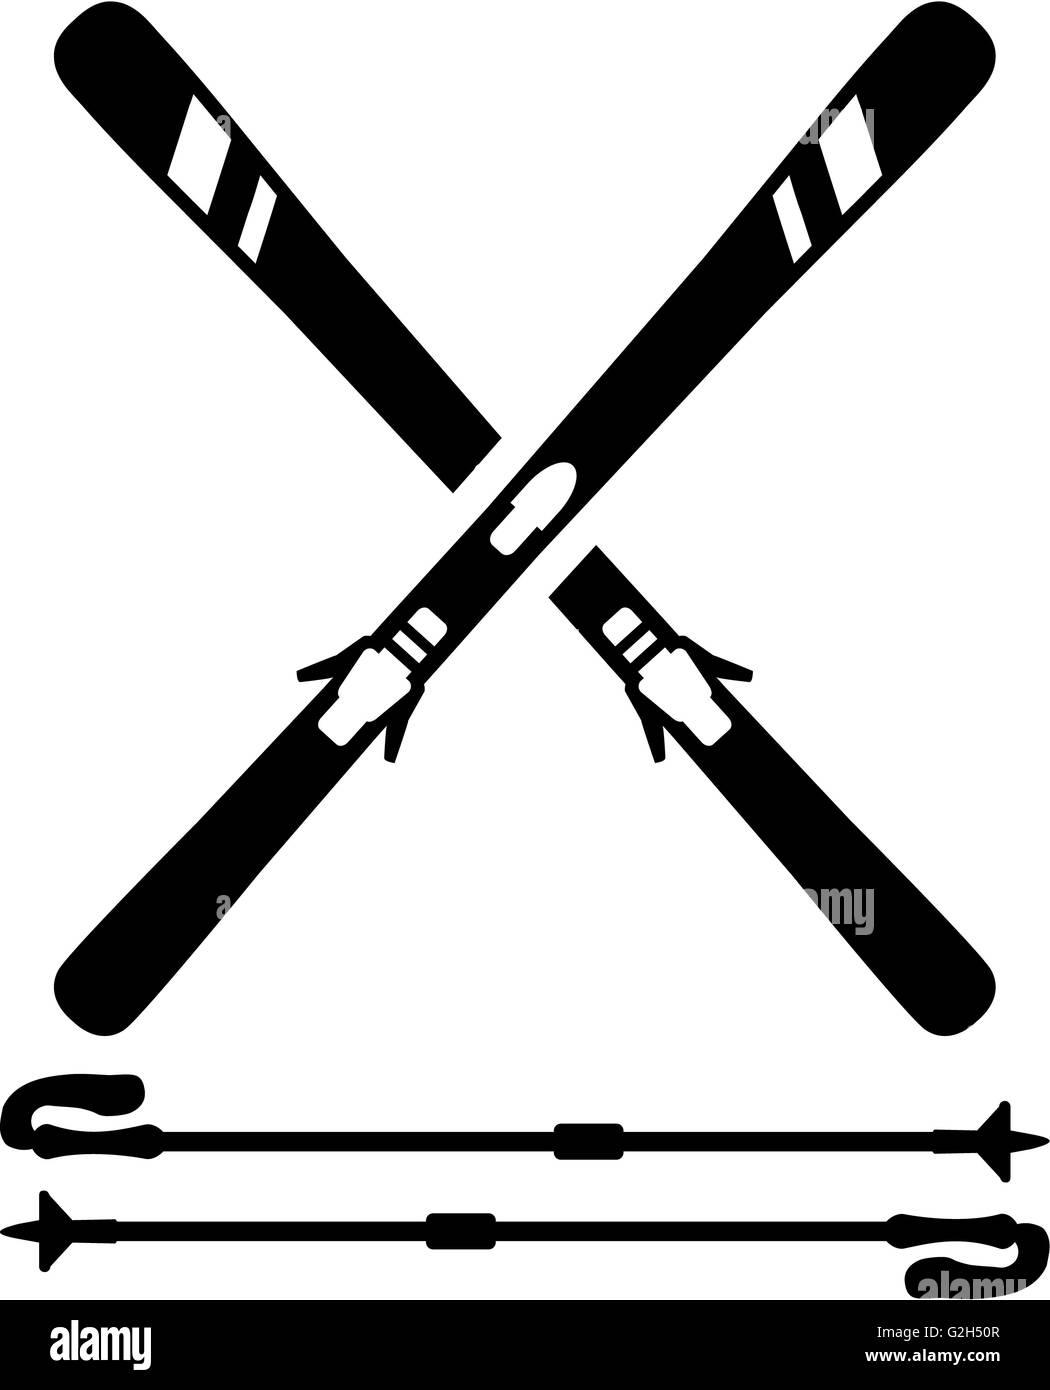 Ski Equipment Skis Sticks - Stock Image